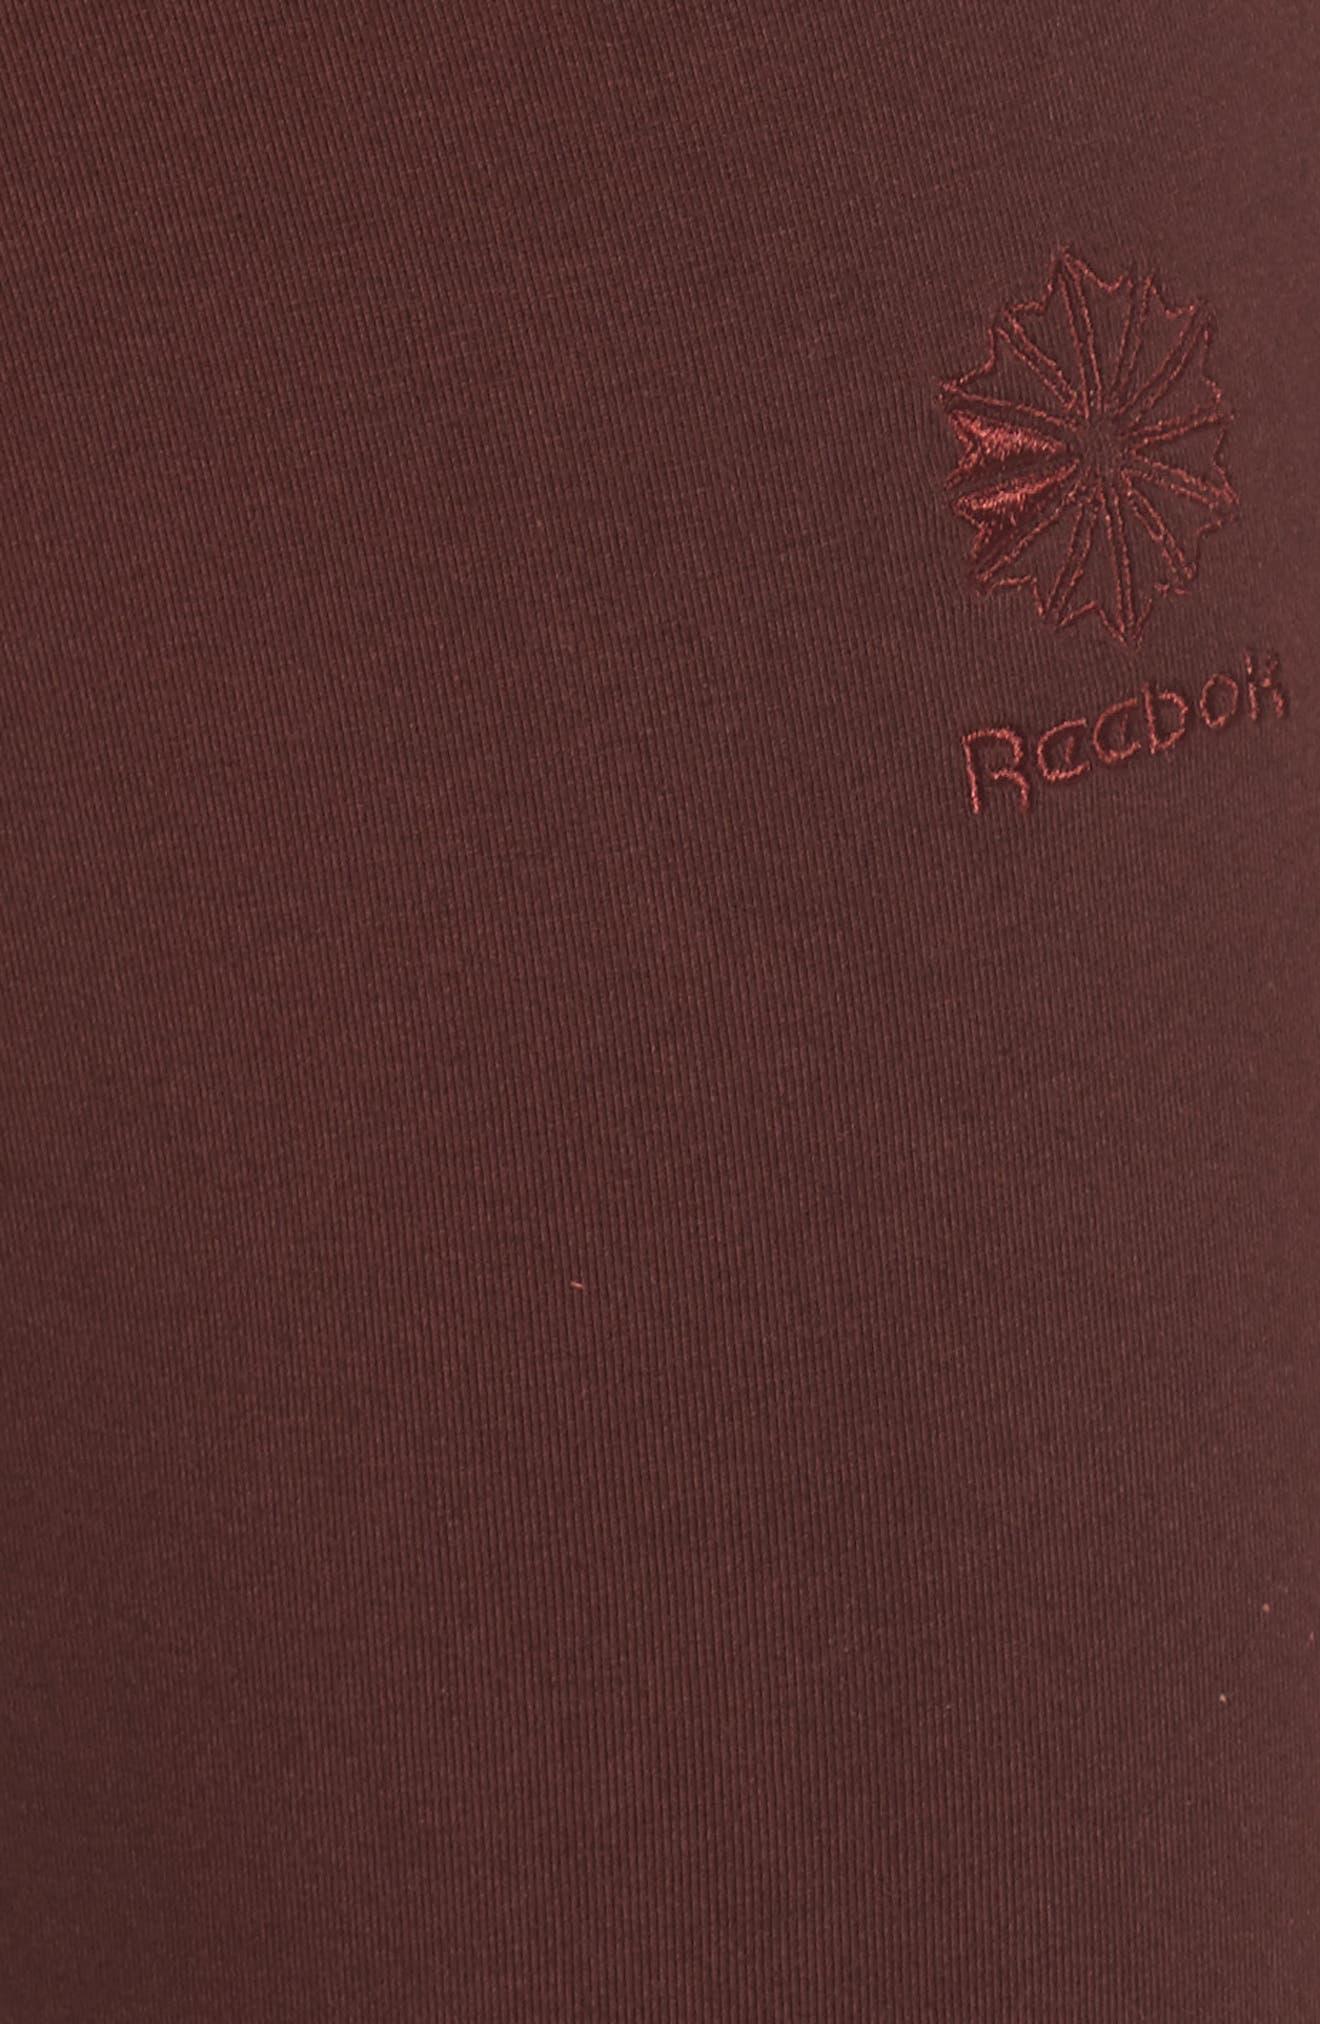 Fit Franchise Leggings,                             Alternate thumbnail 6, color,                             930